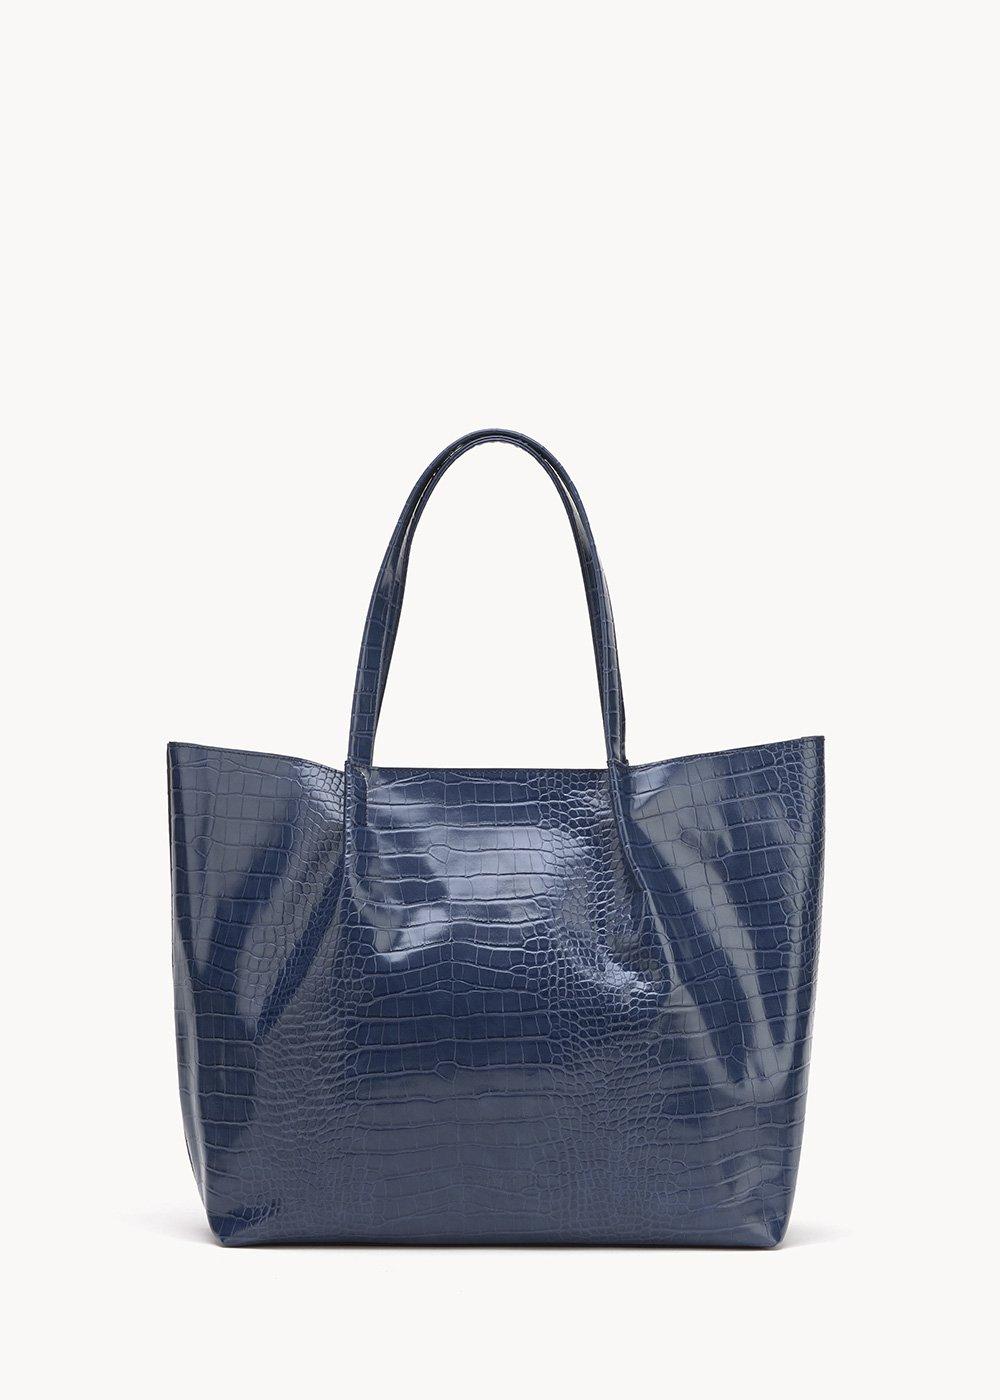 Blanch shopping bag with crocodile print - Marina - Woman